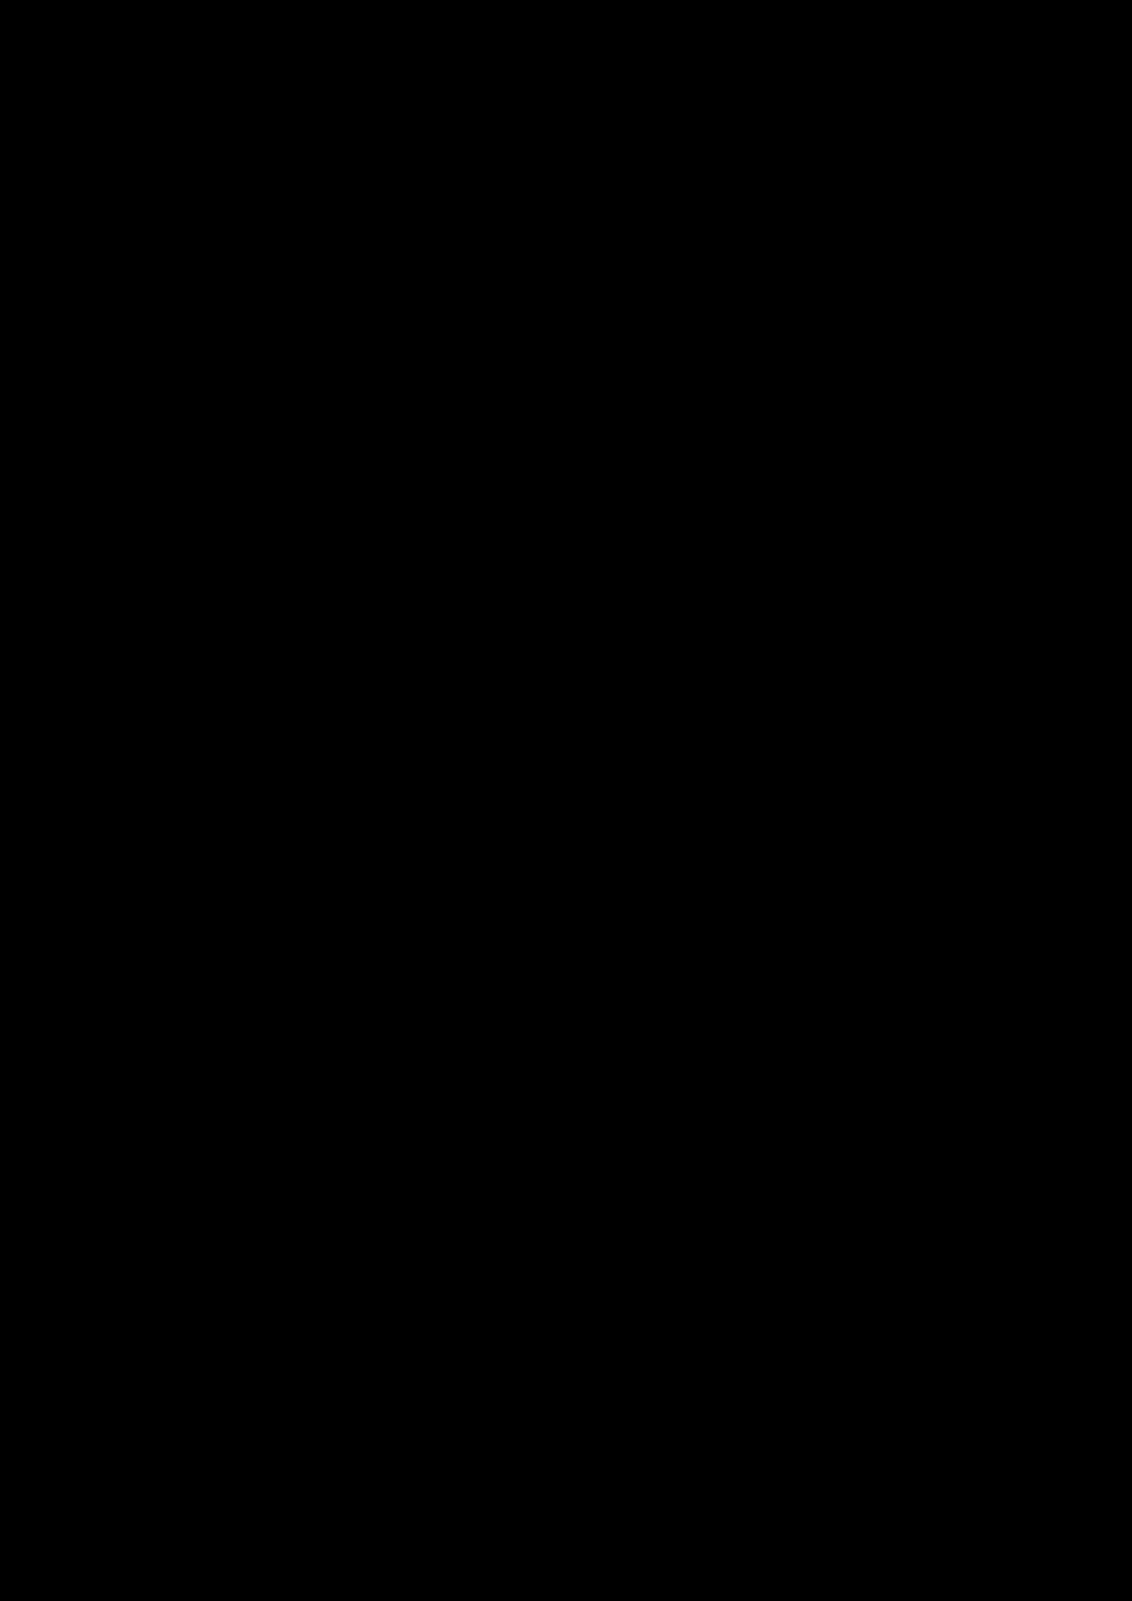 Ispoved Pervogo Boga slide, Image 40